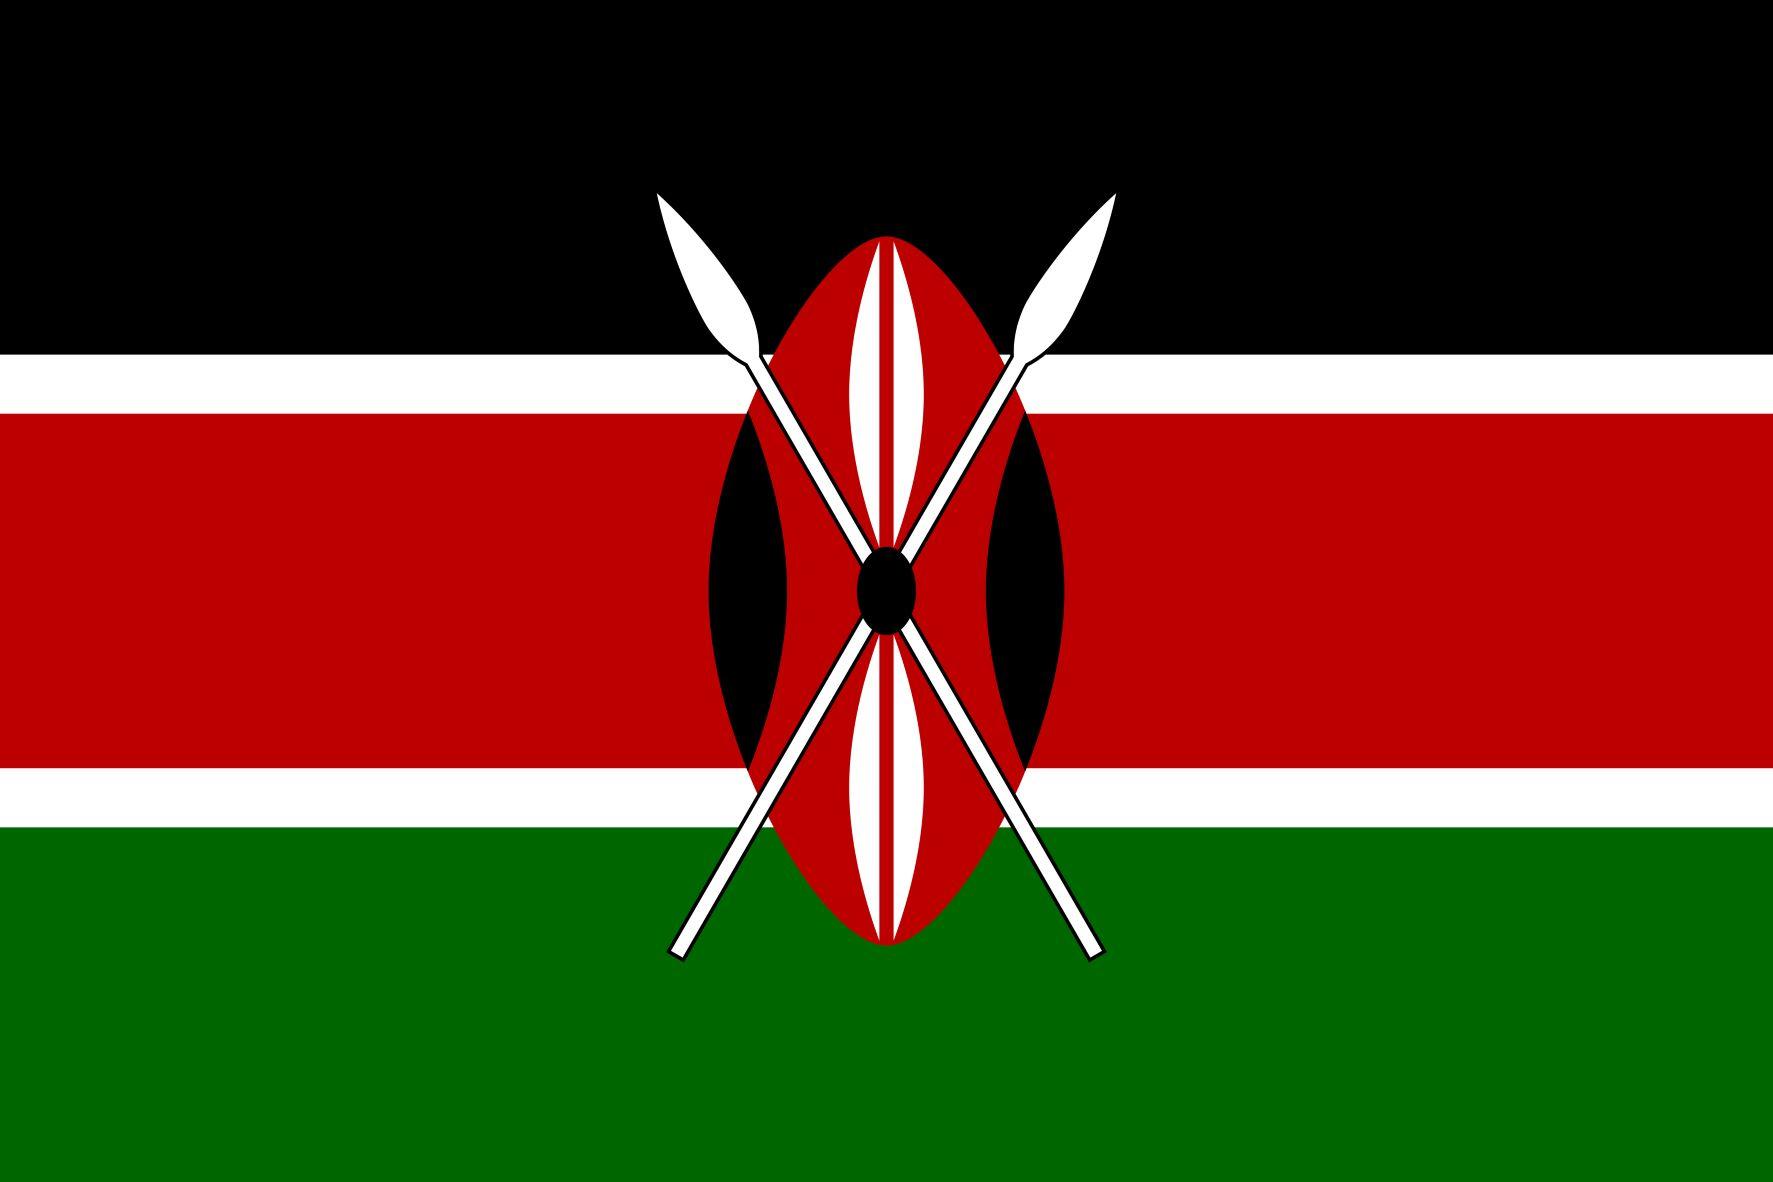 Flag of Kenya, GPI Partner Country